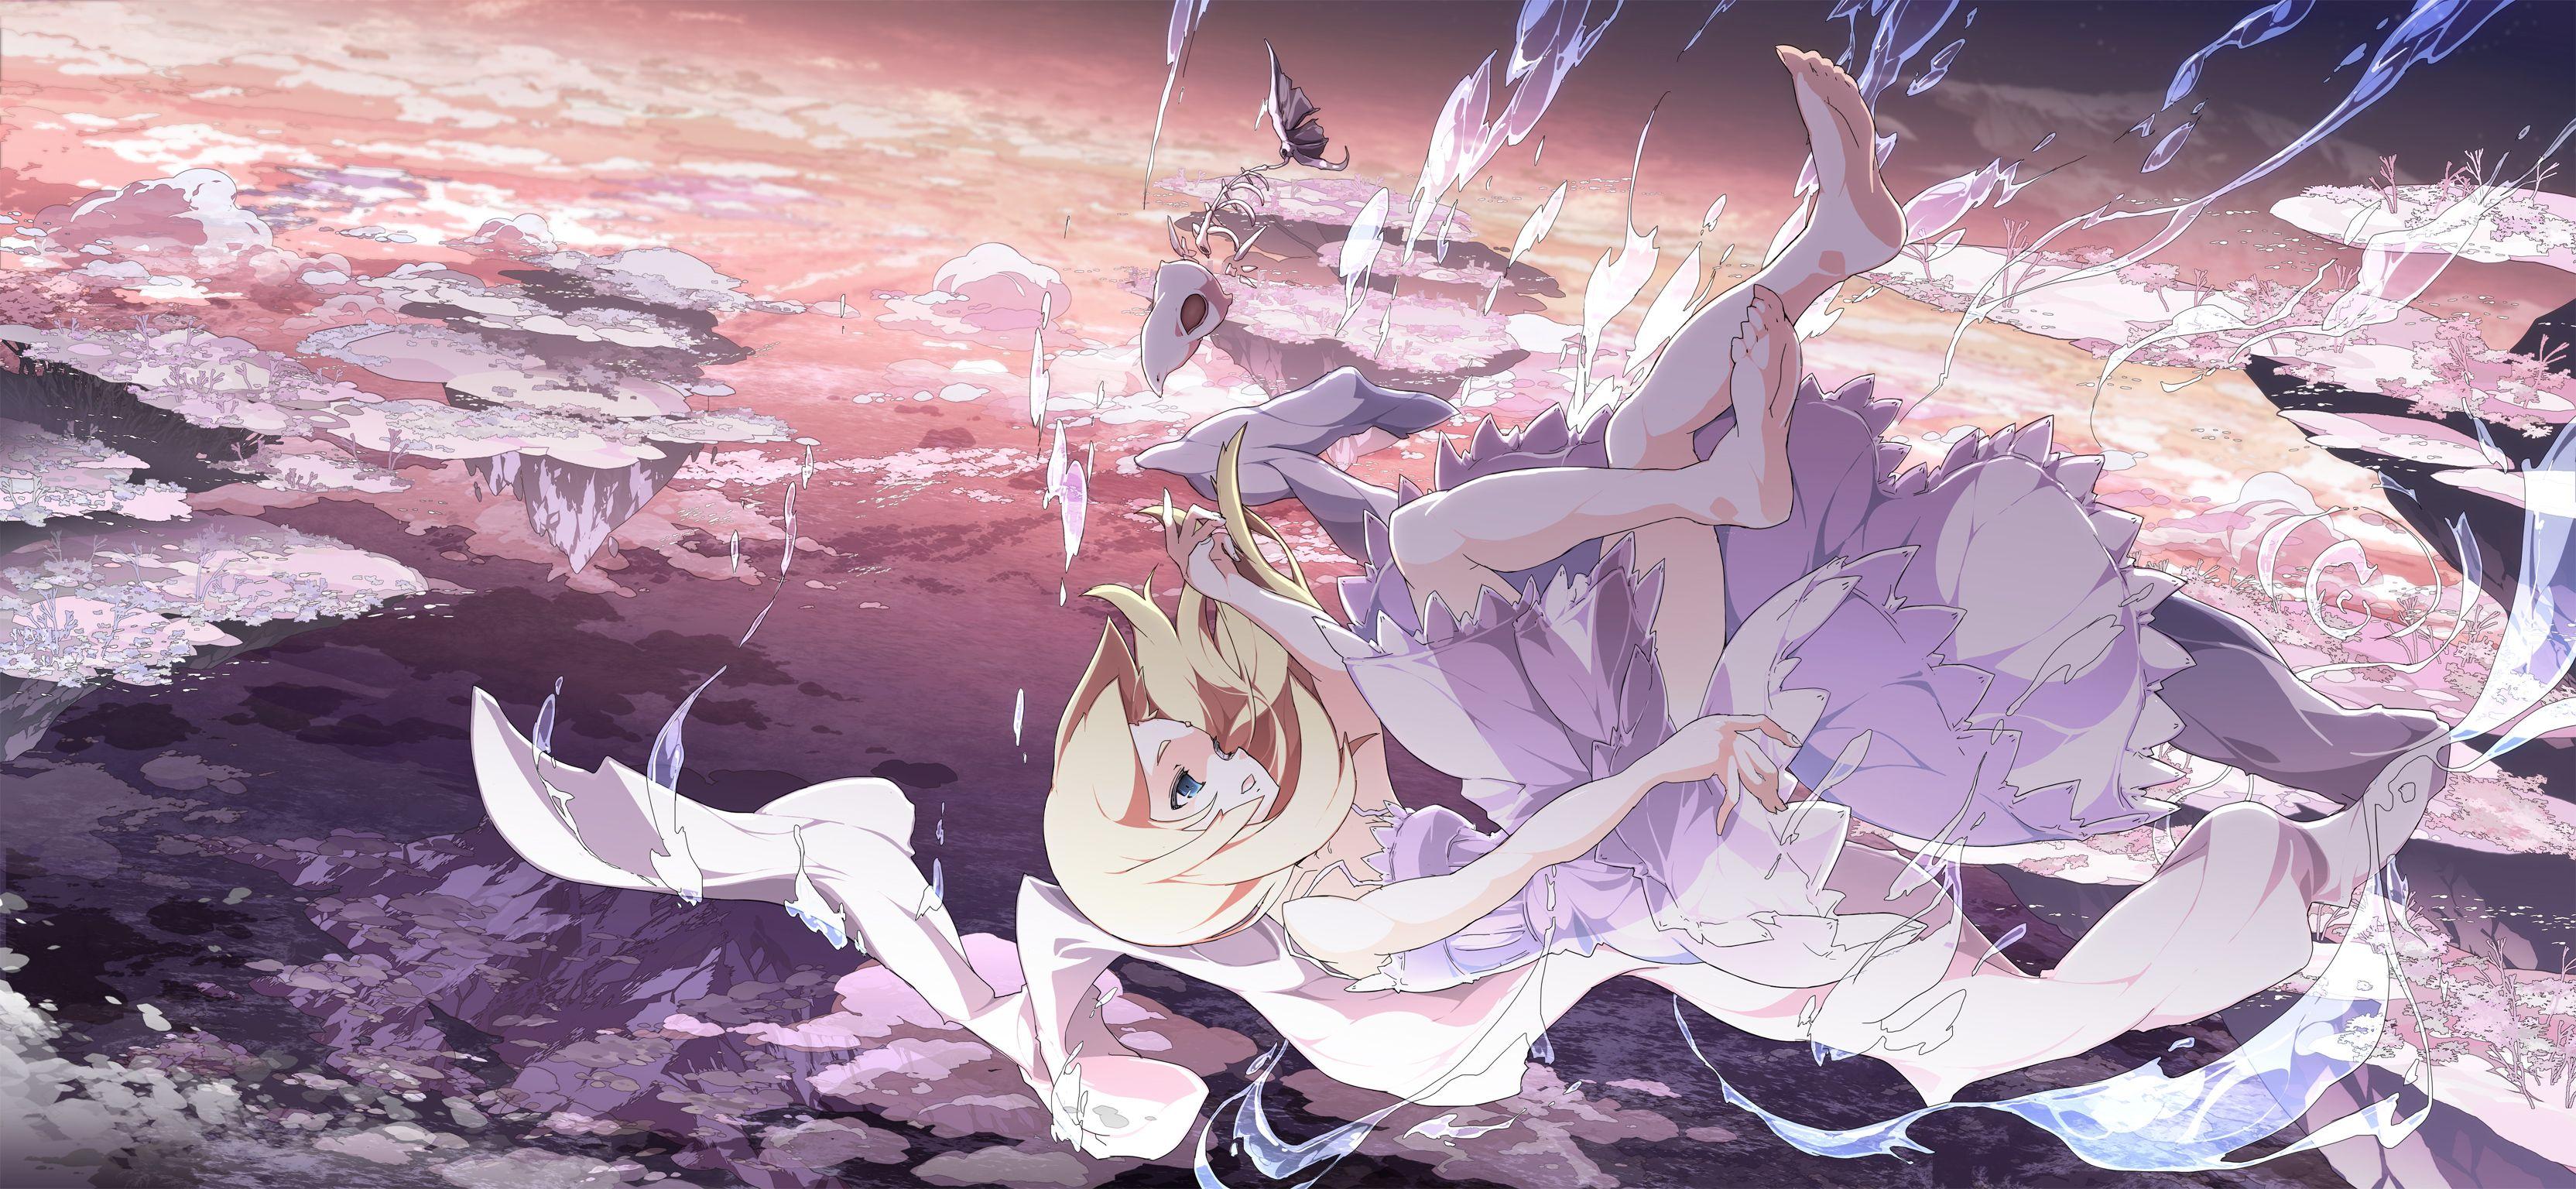 Anime Wallpaper 10 Sky Anime Anime Wallpaper Cool - Anime Girl